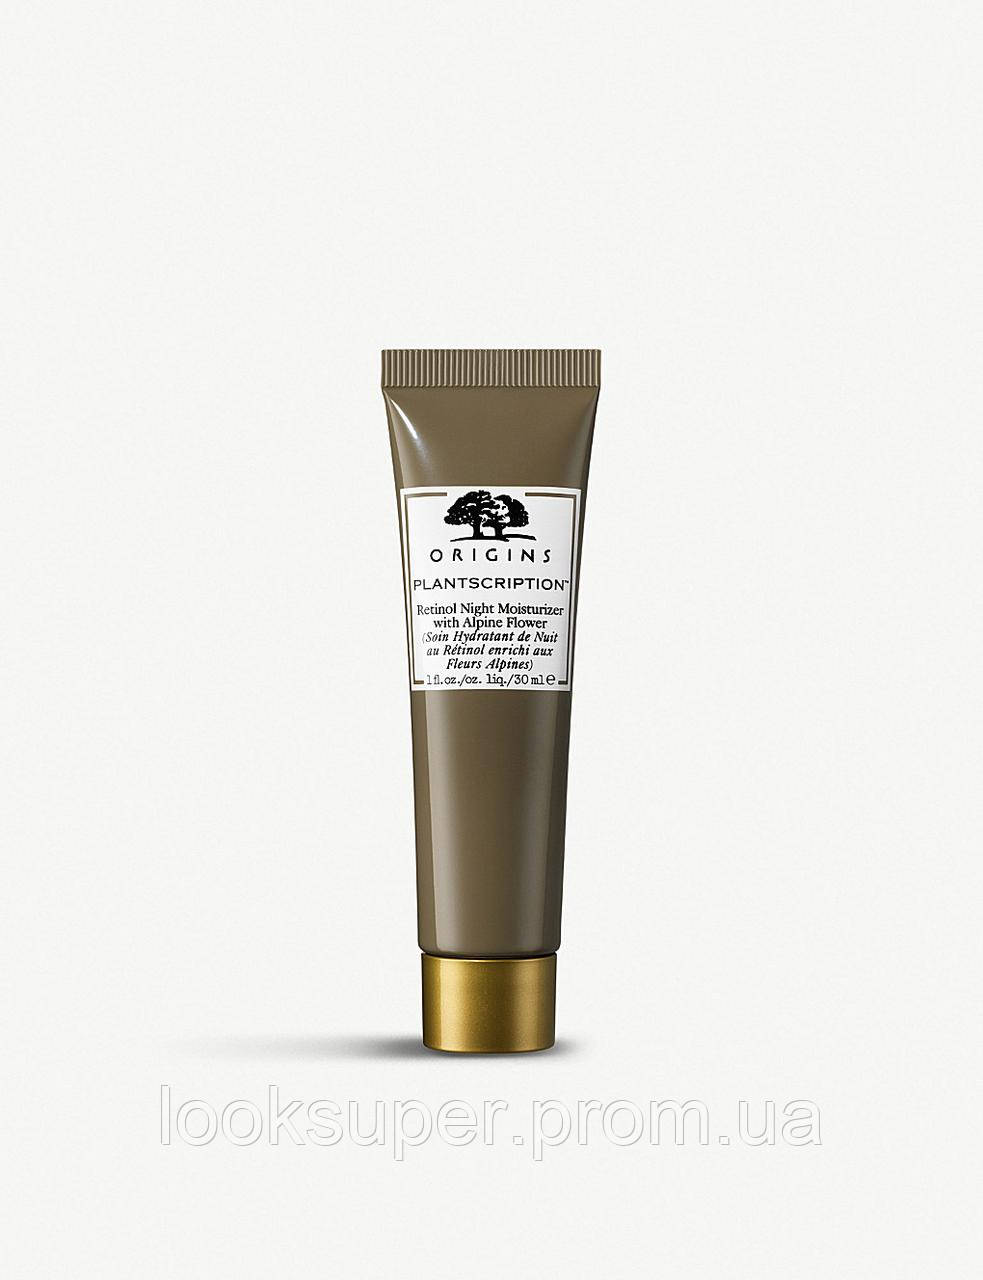 Ночной увлажняющий крем Origins Plantscription retinol night moisturiser 30ml